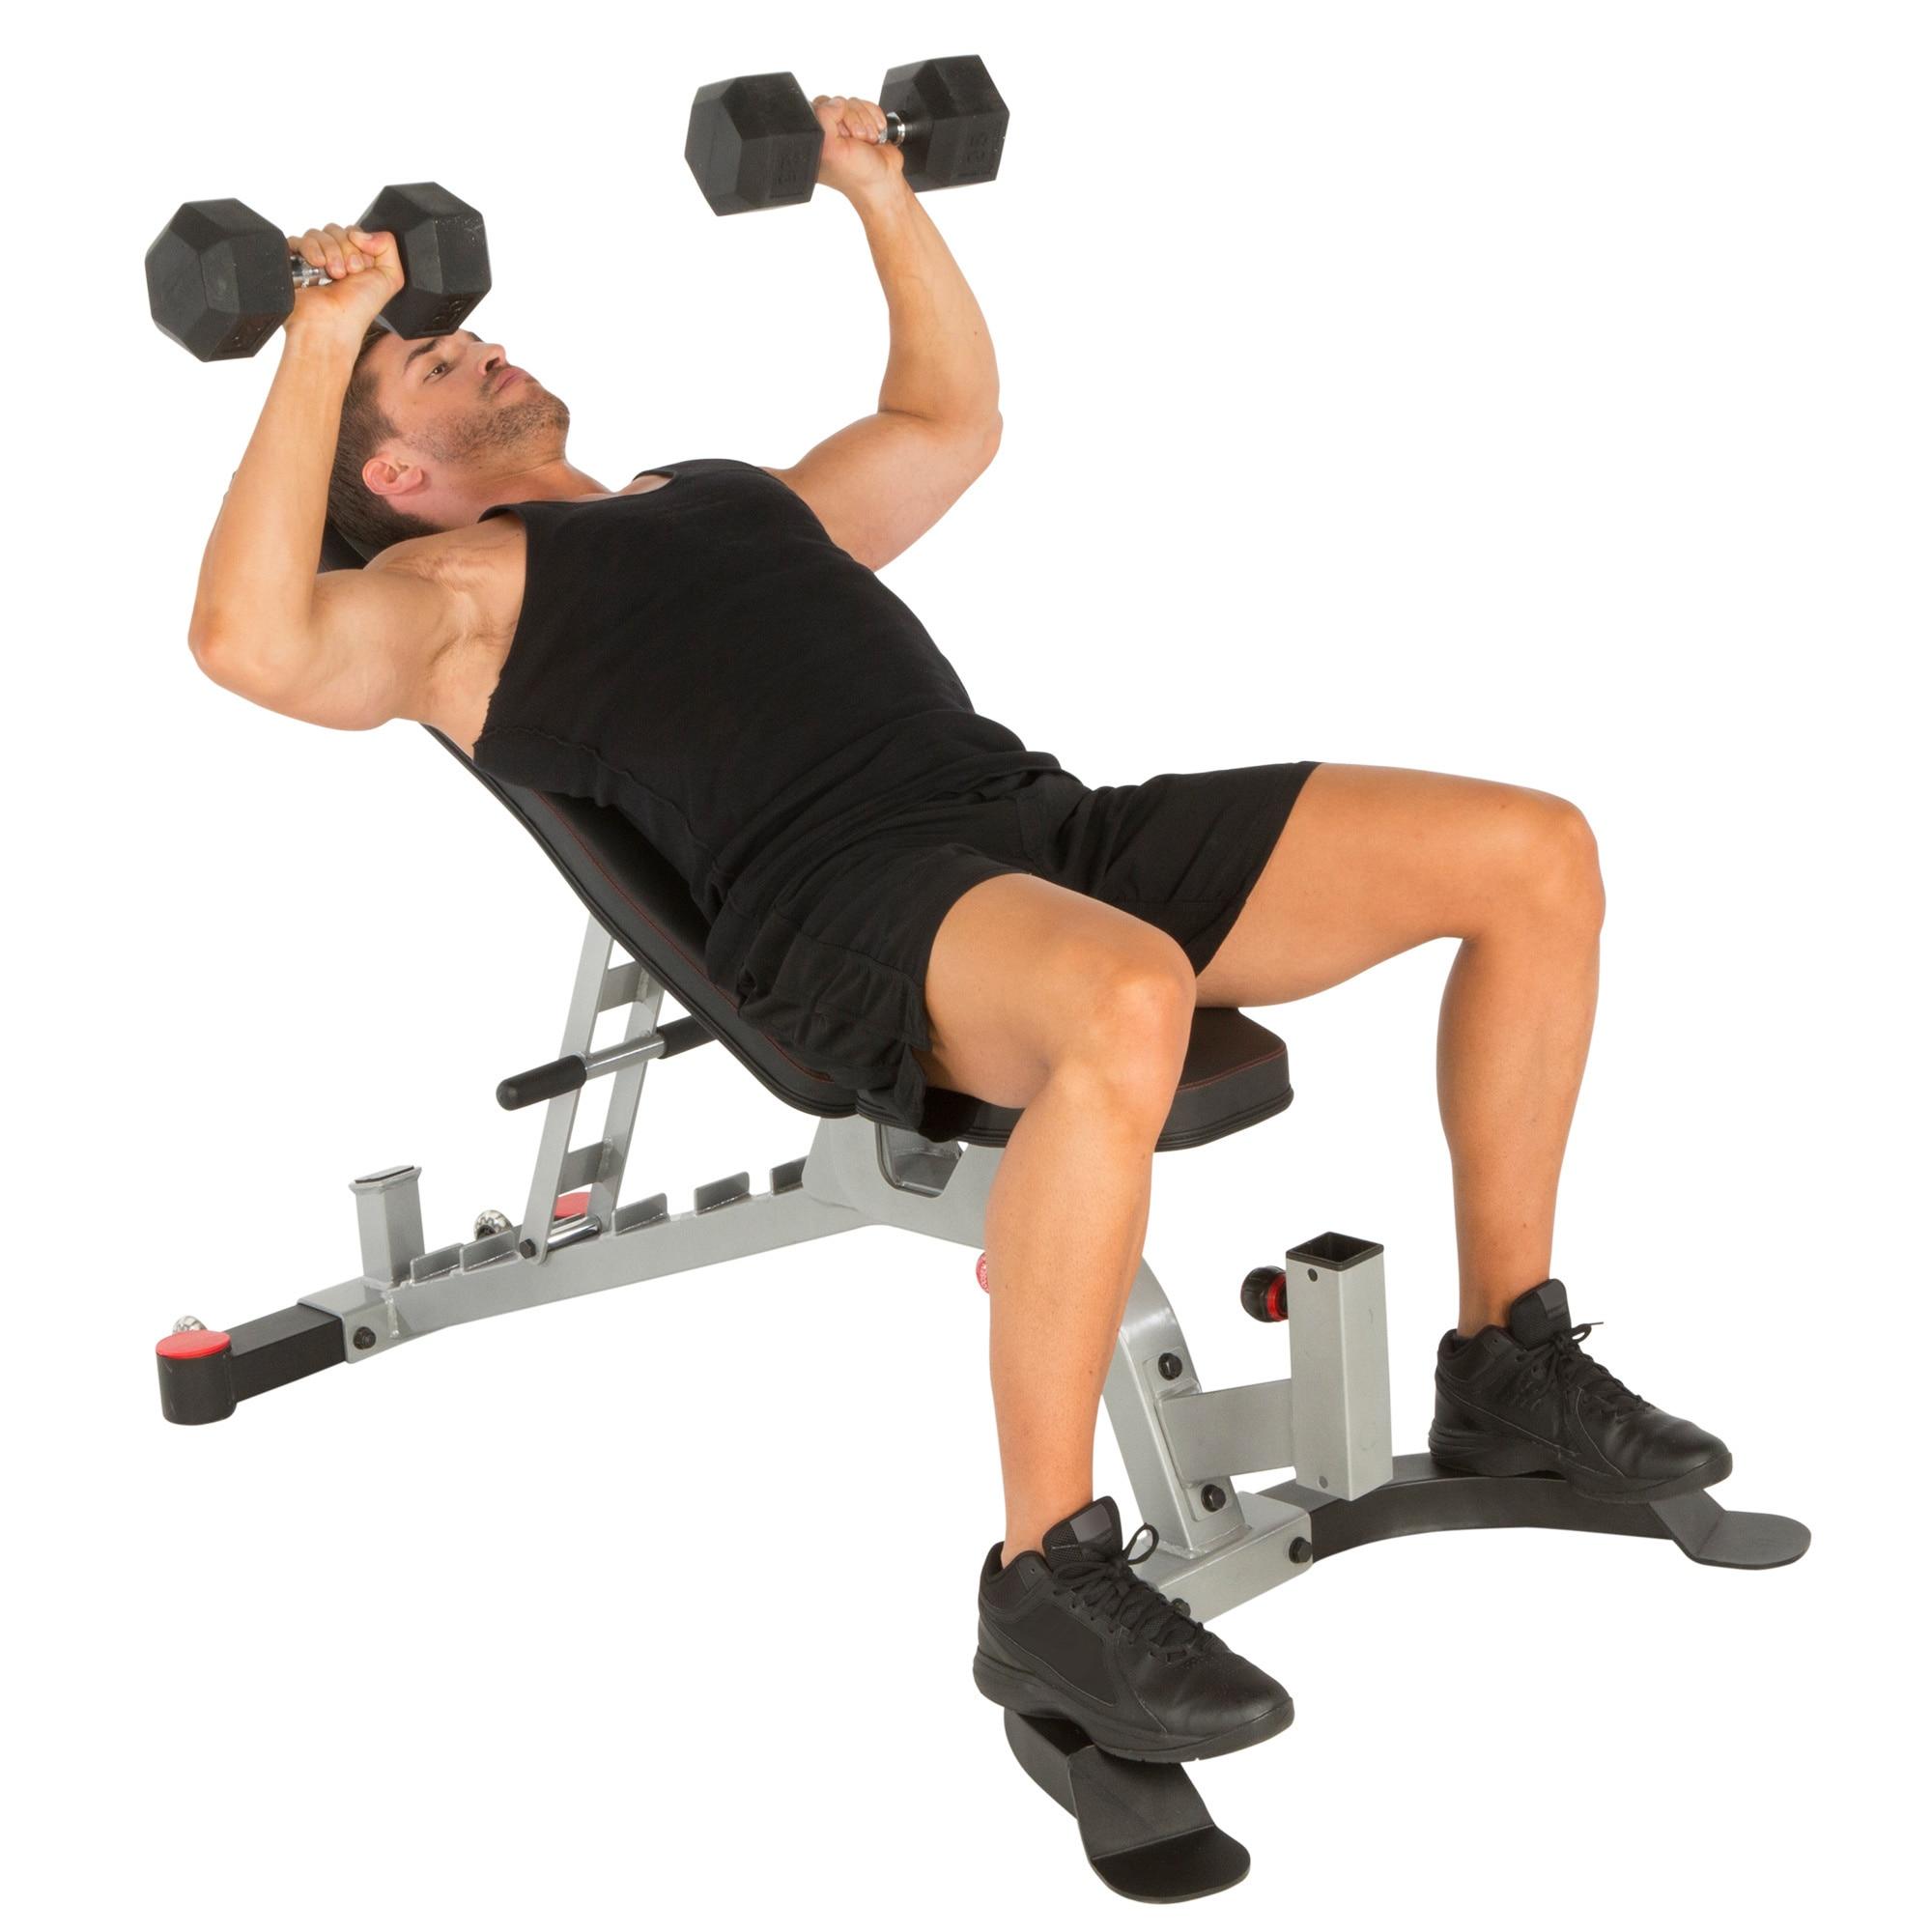 bench black steel capital benches domic equipment en weight bar sports training strength